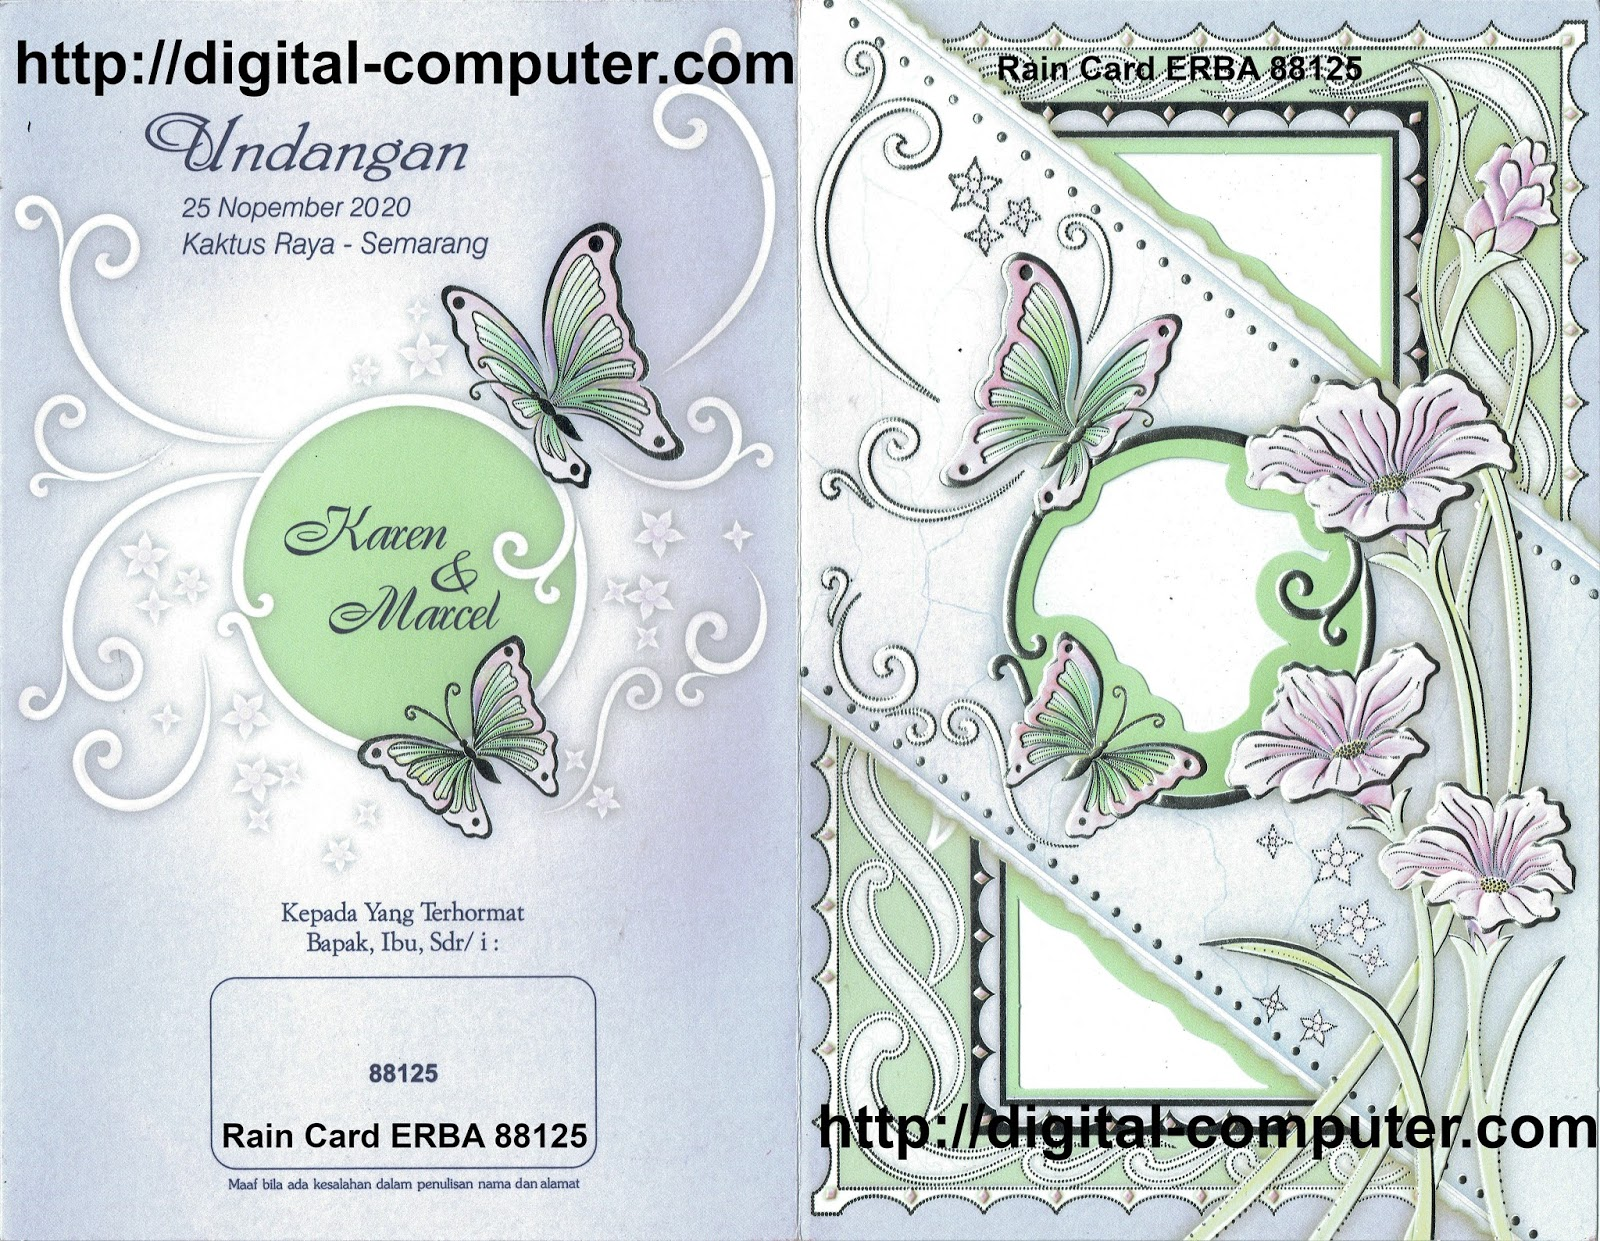 Undangan Softcover ERBA 88125